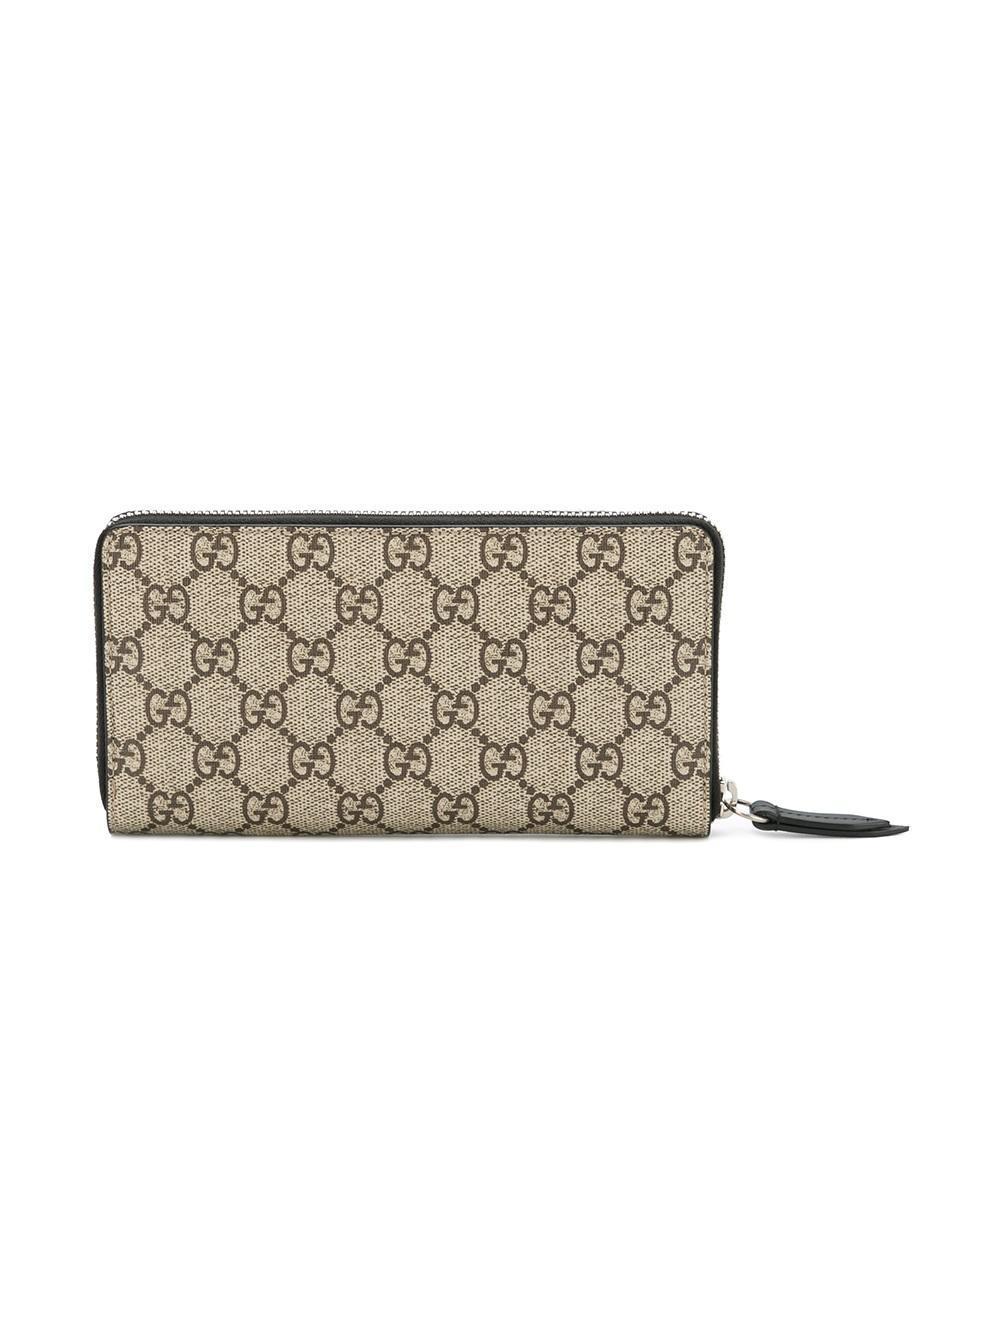 94d5b4012fe0 Gucci Snake Wallet Poshmark   Casper's & Runyon's Shamrocks   Nook